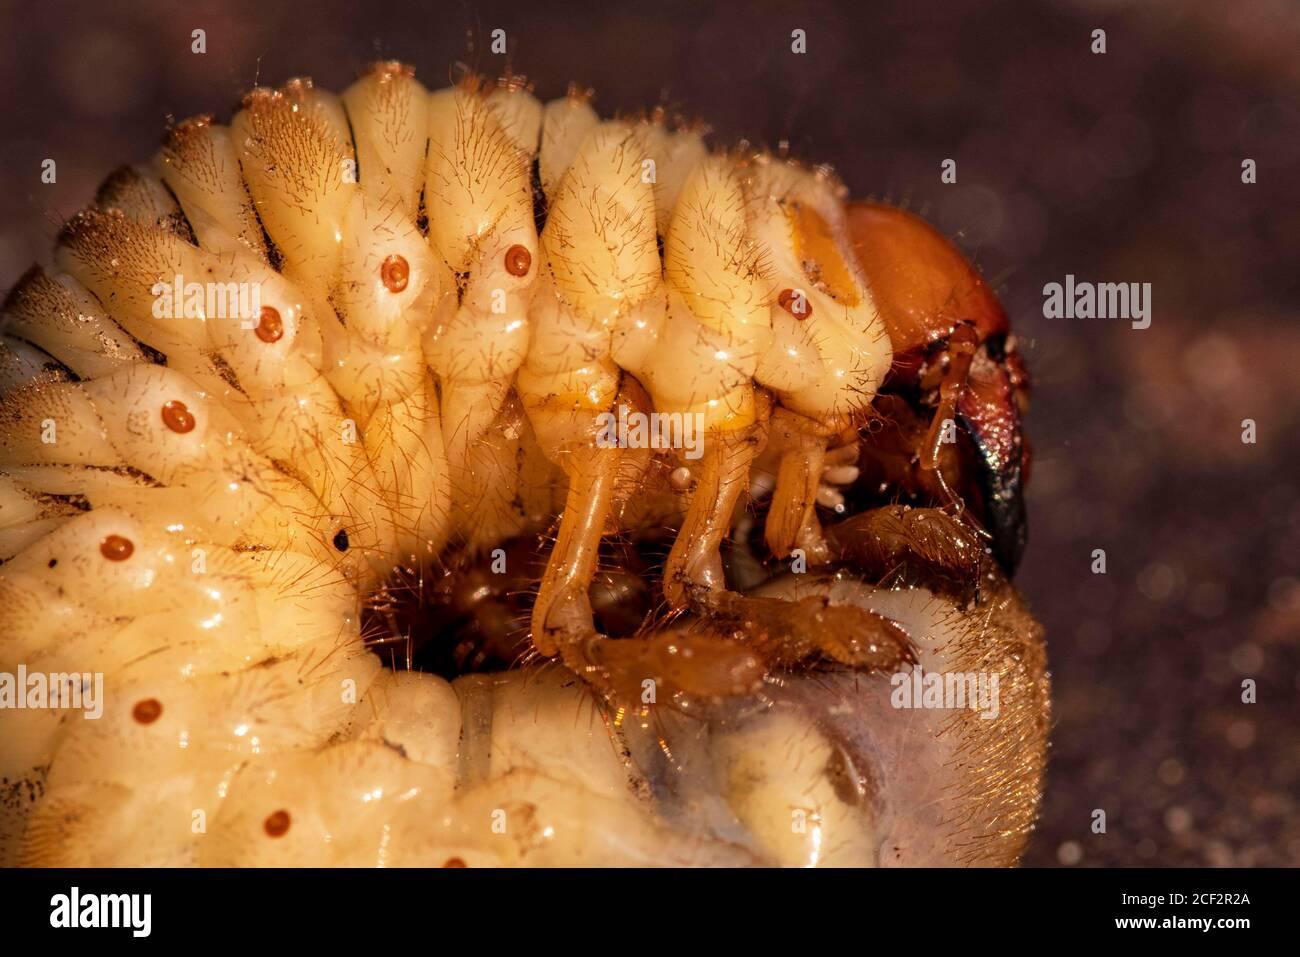 May beetle larvae.Larvae of dung beetle close-up. Stock Photo